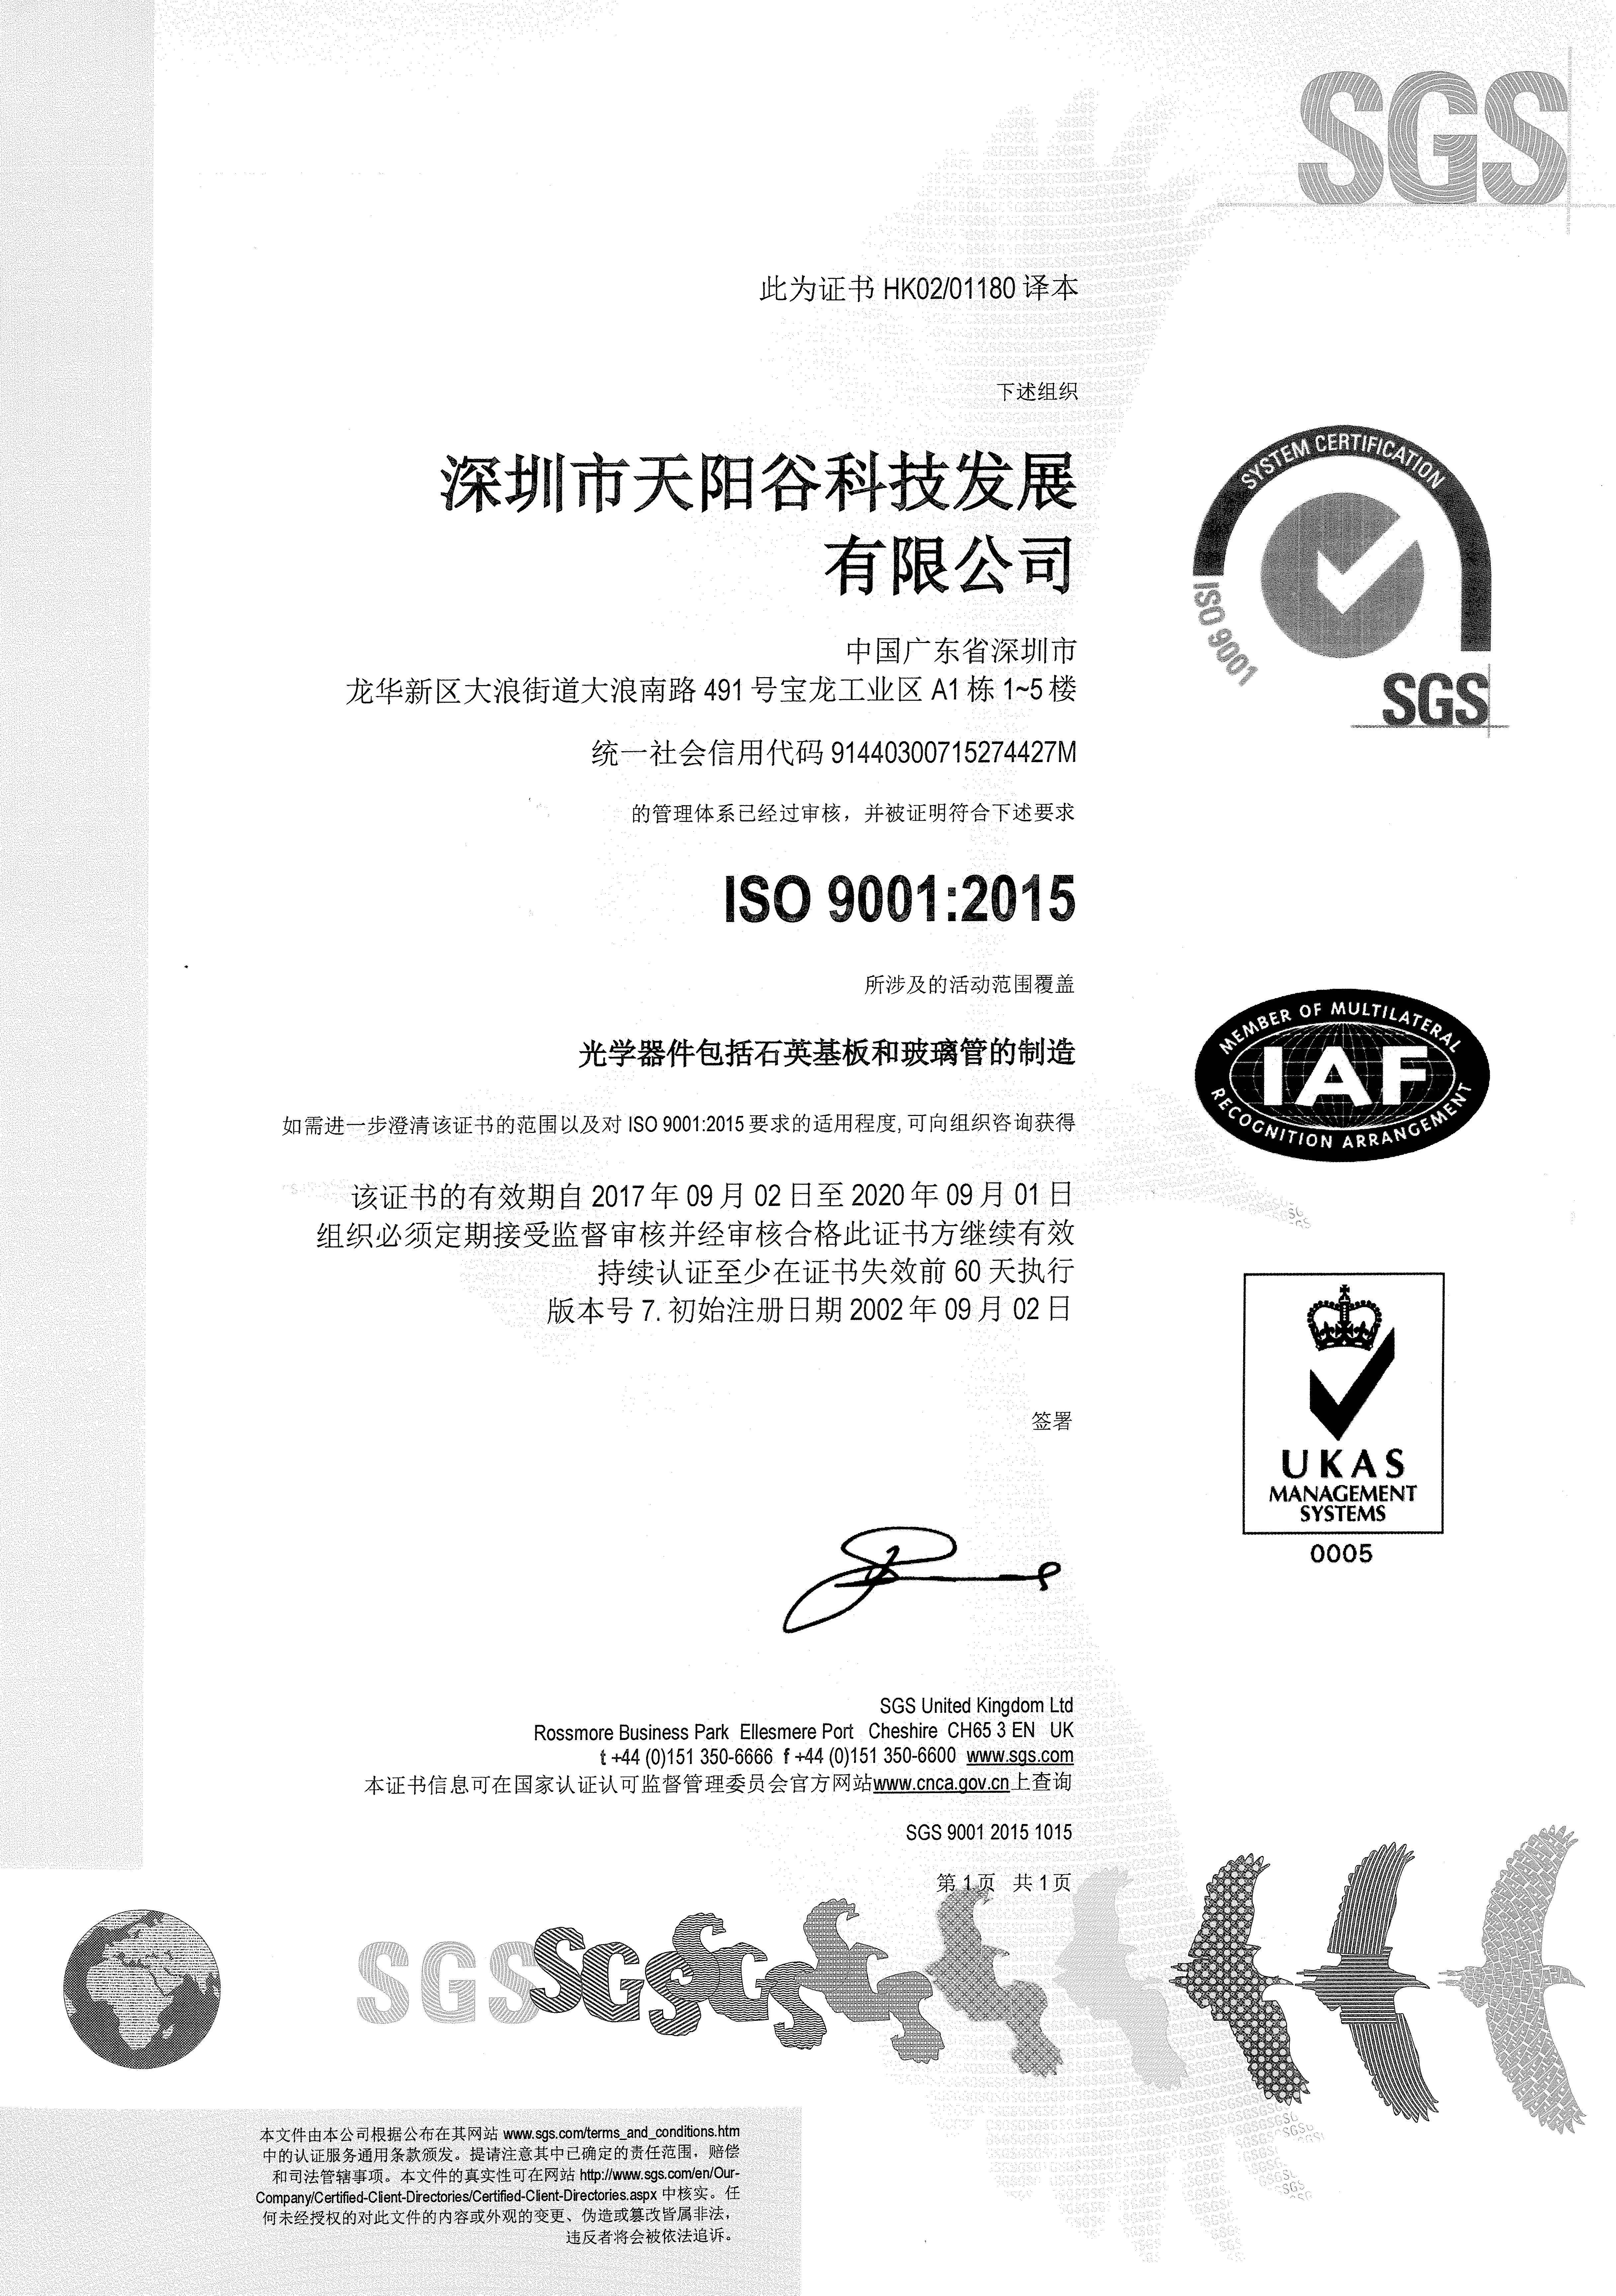 天阳谷ISO9001质量管理体系证书